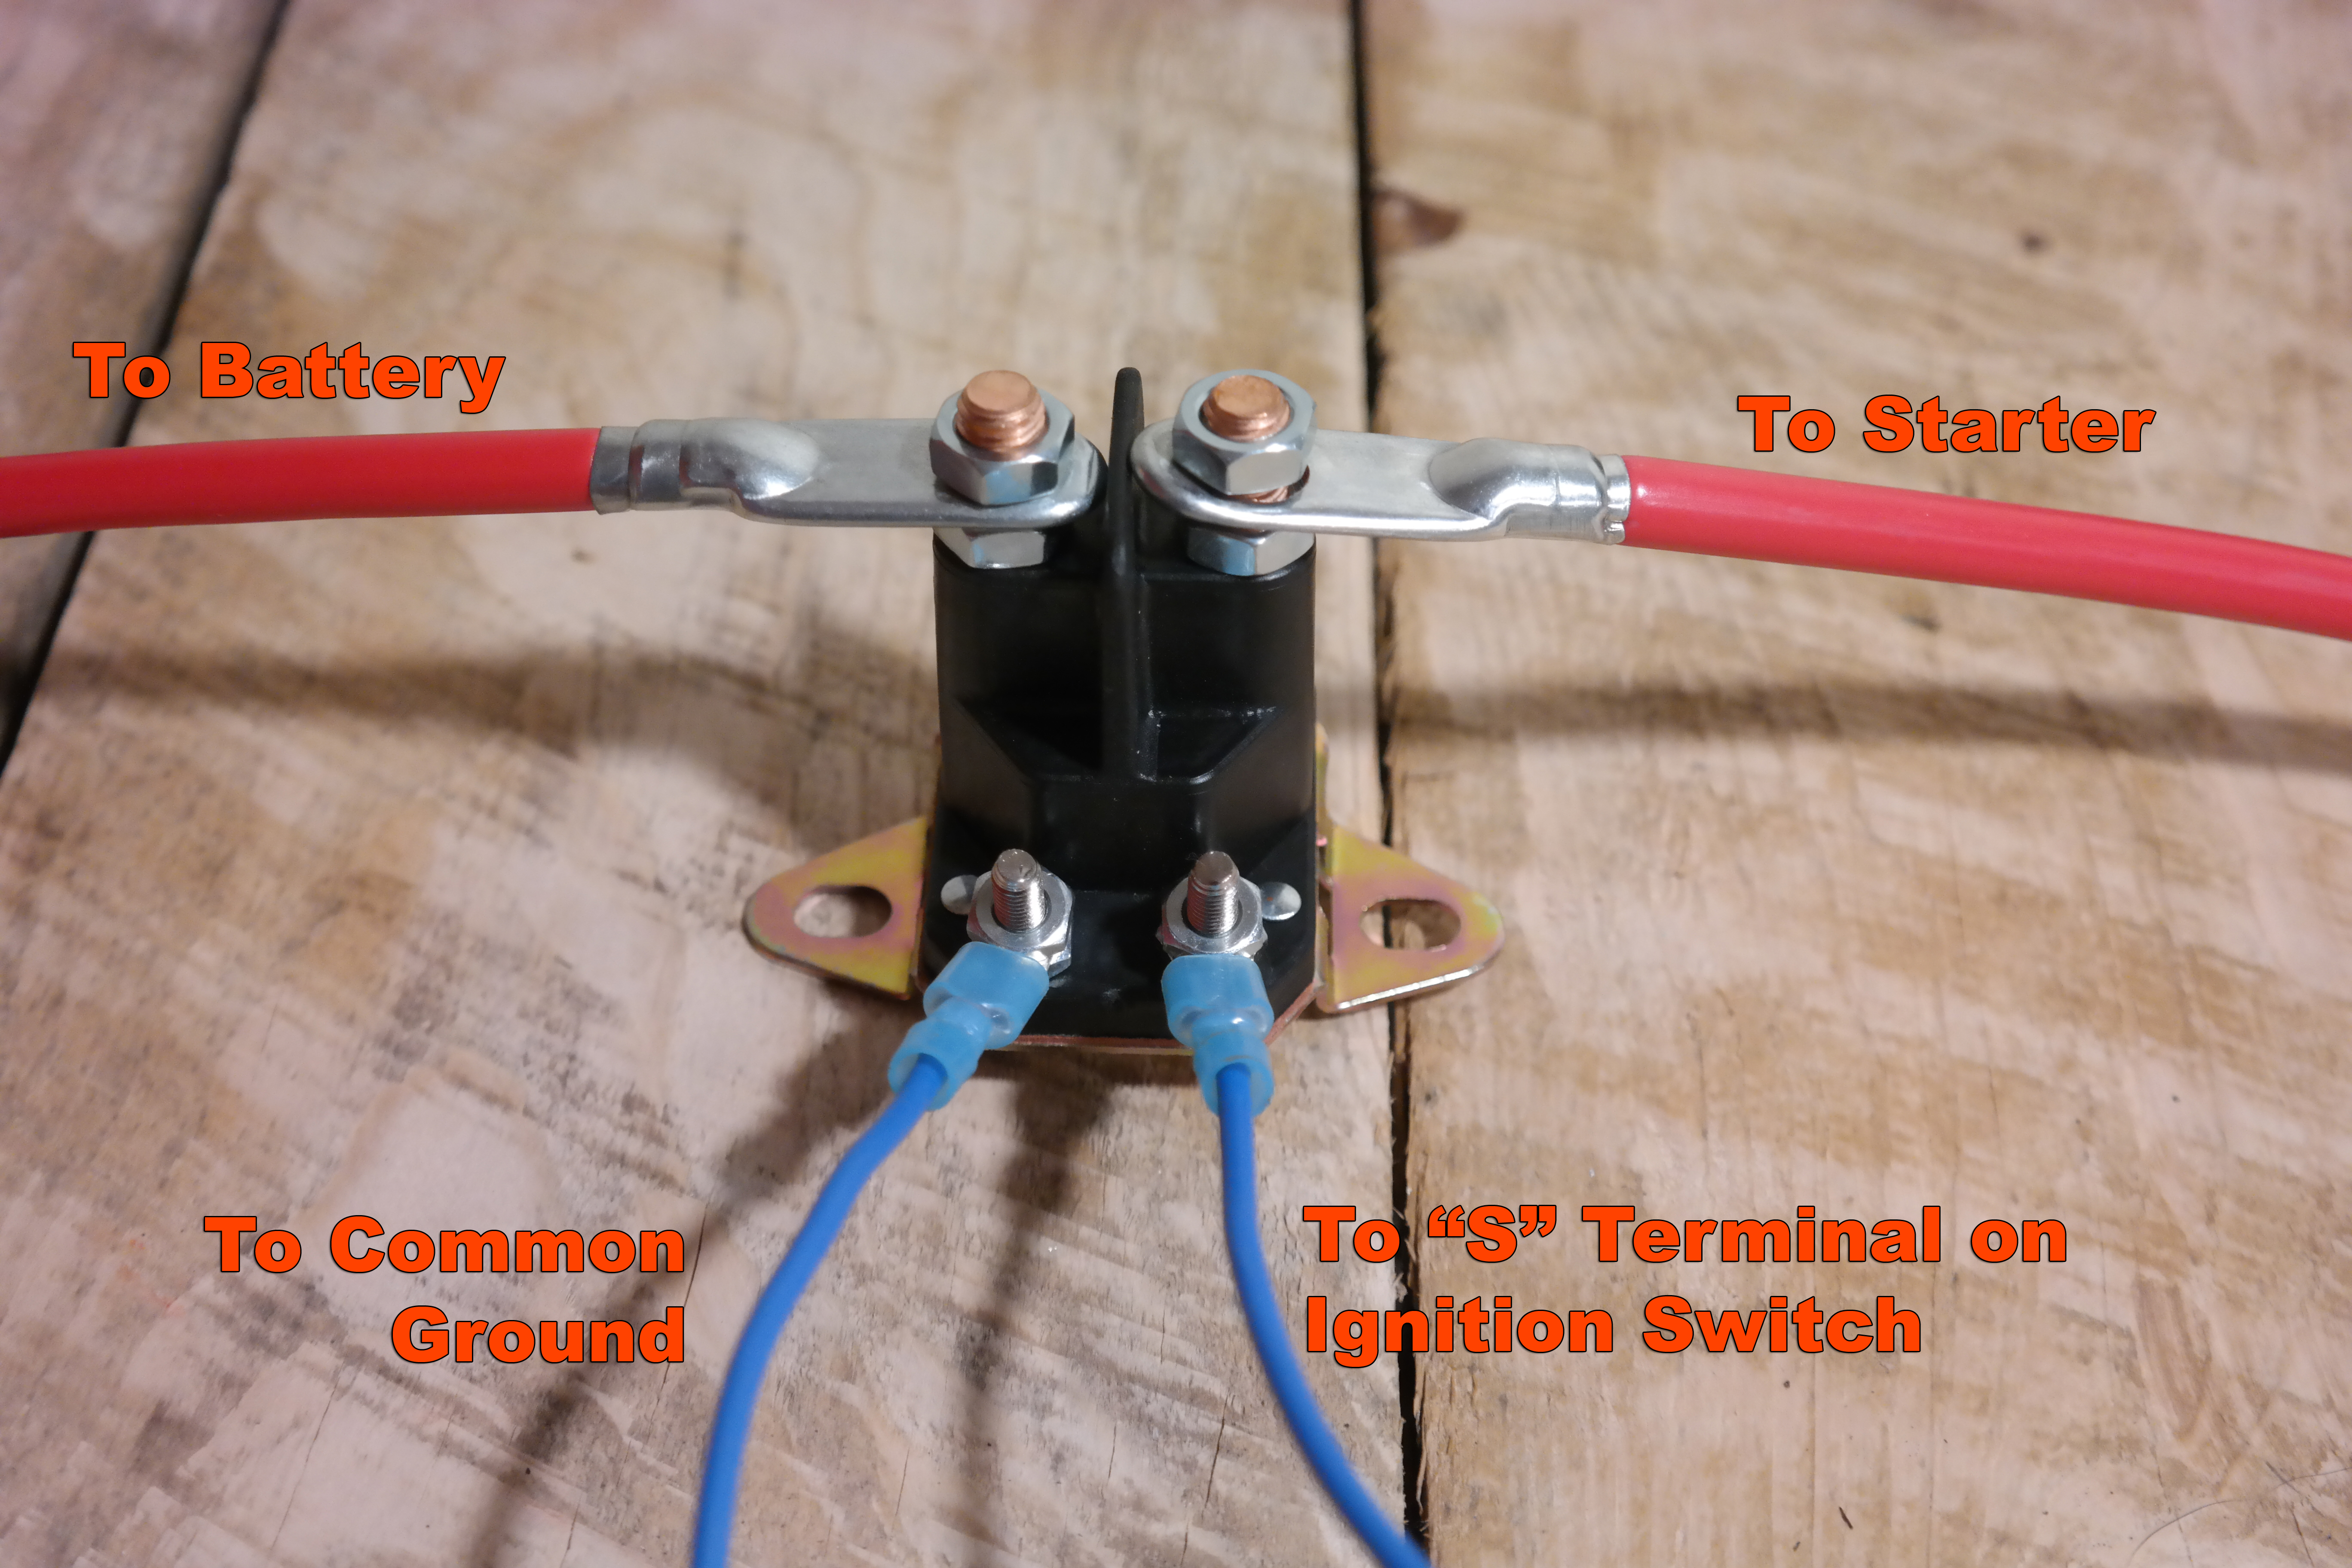 starter solenoid copy?t=1484665717 starter solenoid copy jpg?t=1484665717 Kohler Key Switch Wiring Diagram at creativeand.co